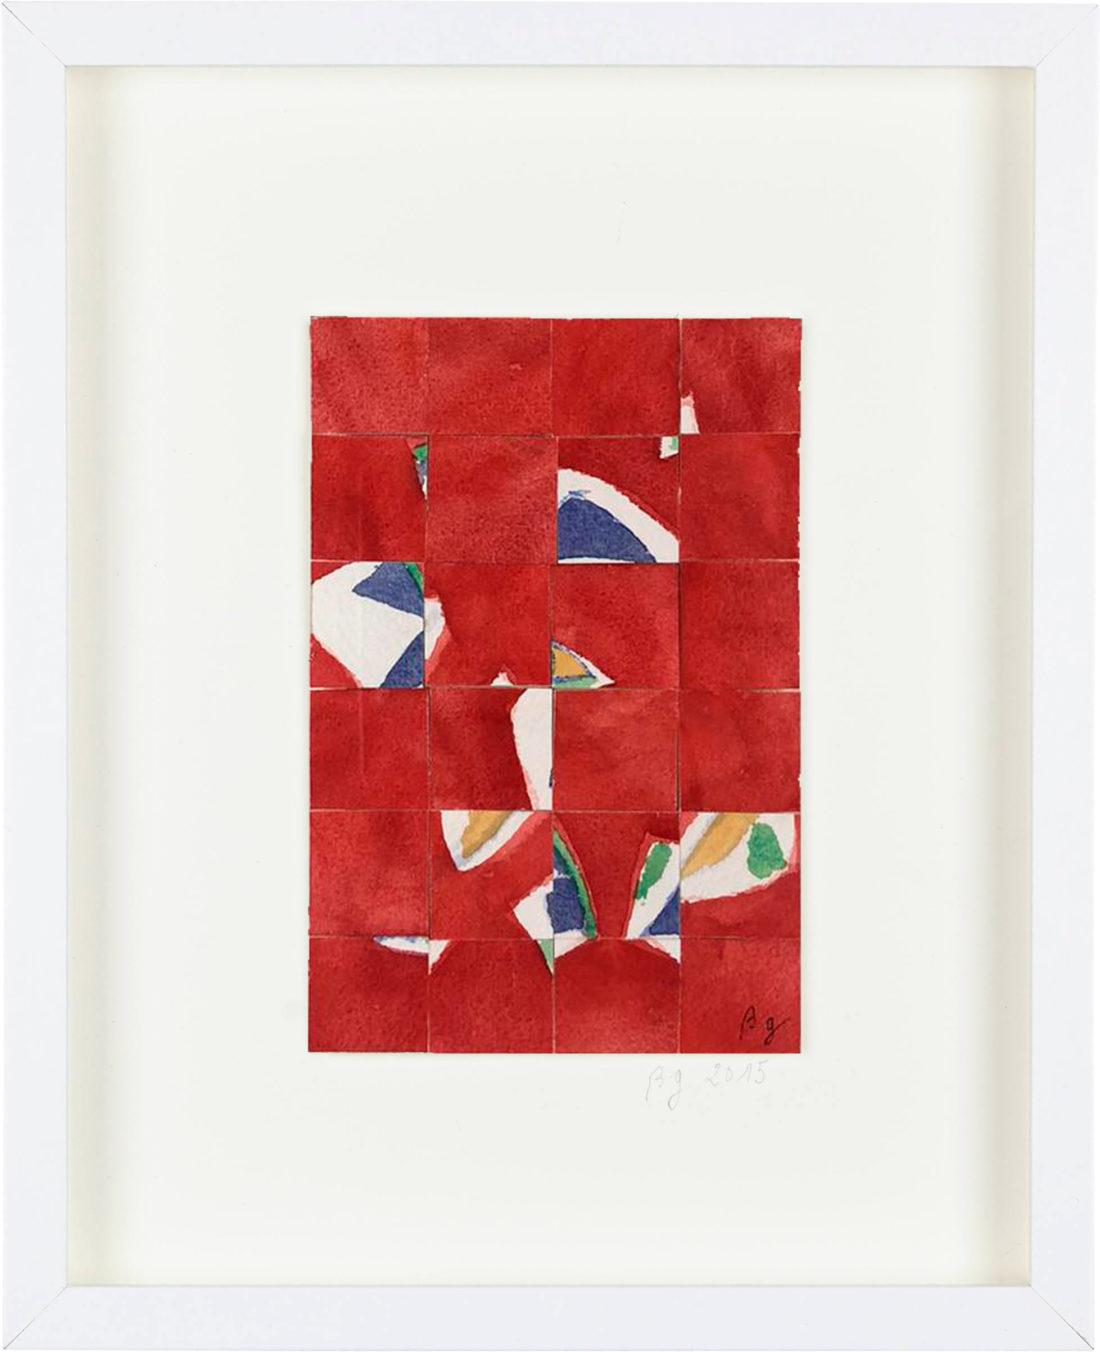 Bernard Gortais - Oeuvre sur papier - Composition 066